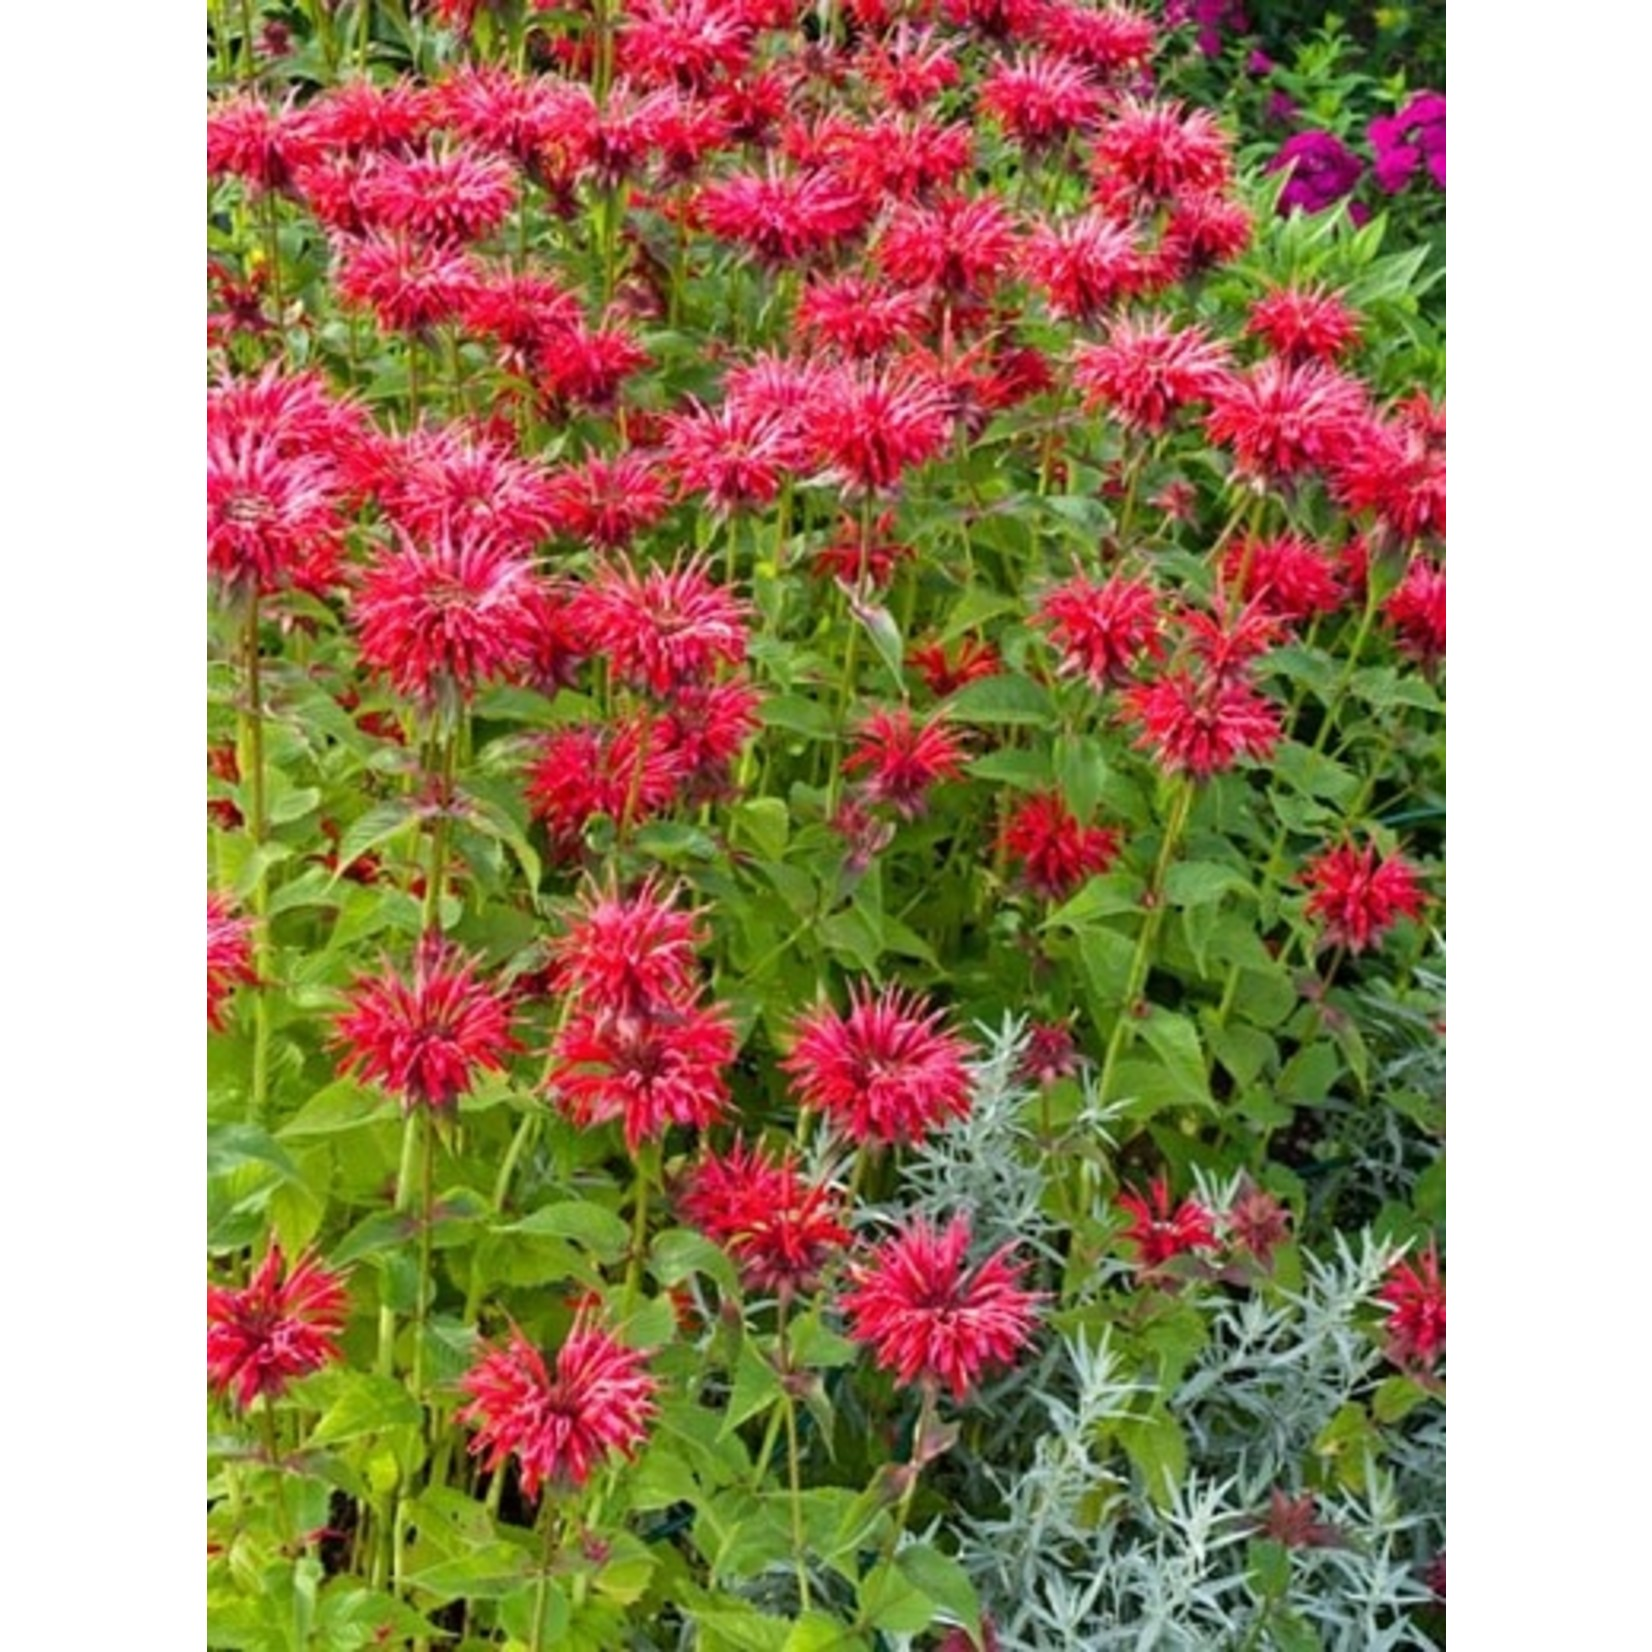 Beebalm 'Monarda Gardenview Scarlet' - 1 gal